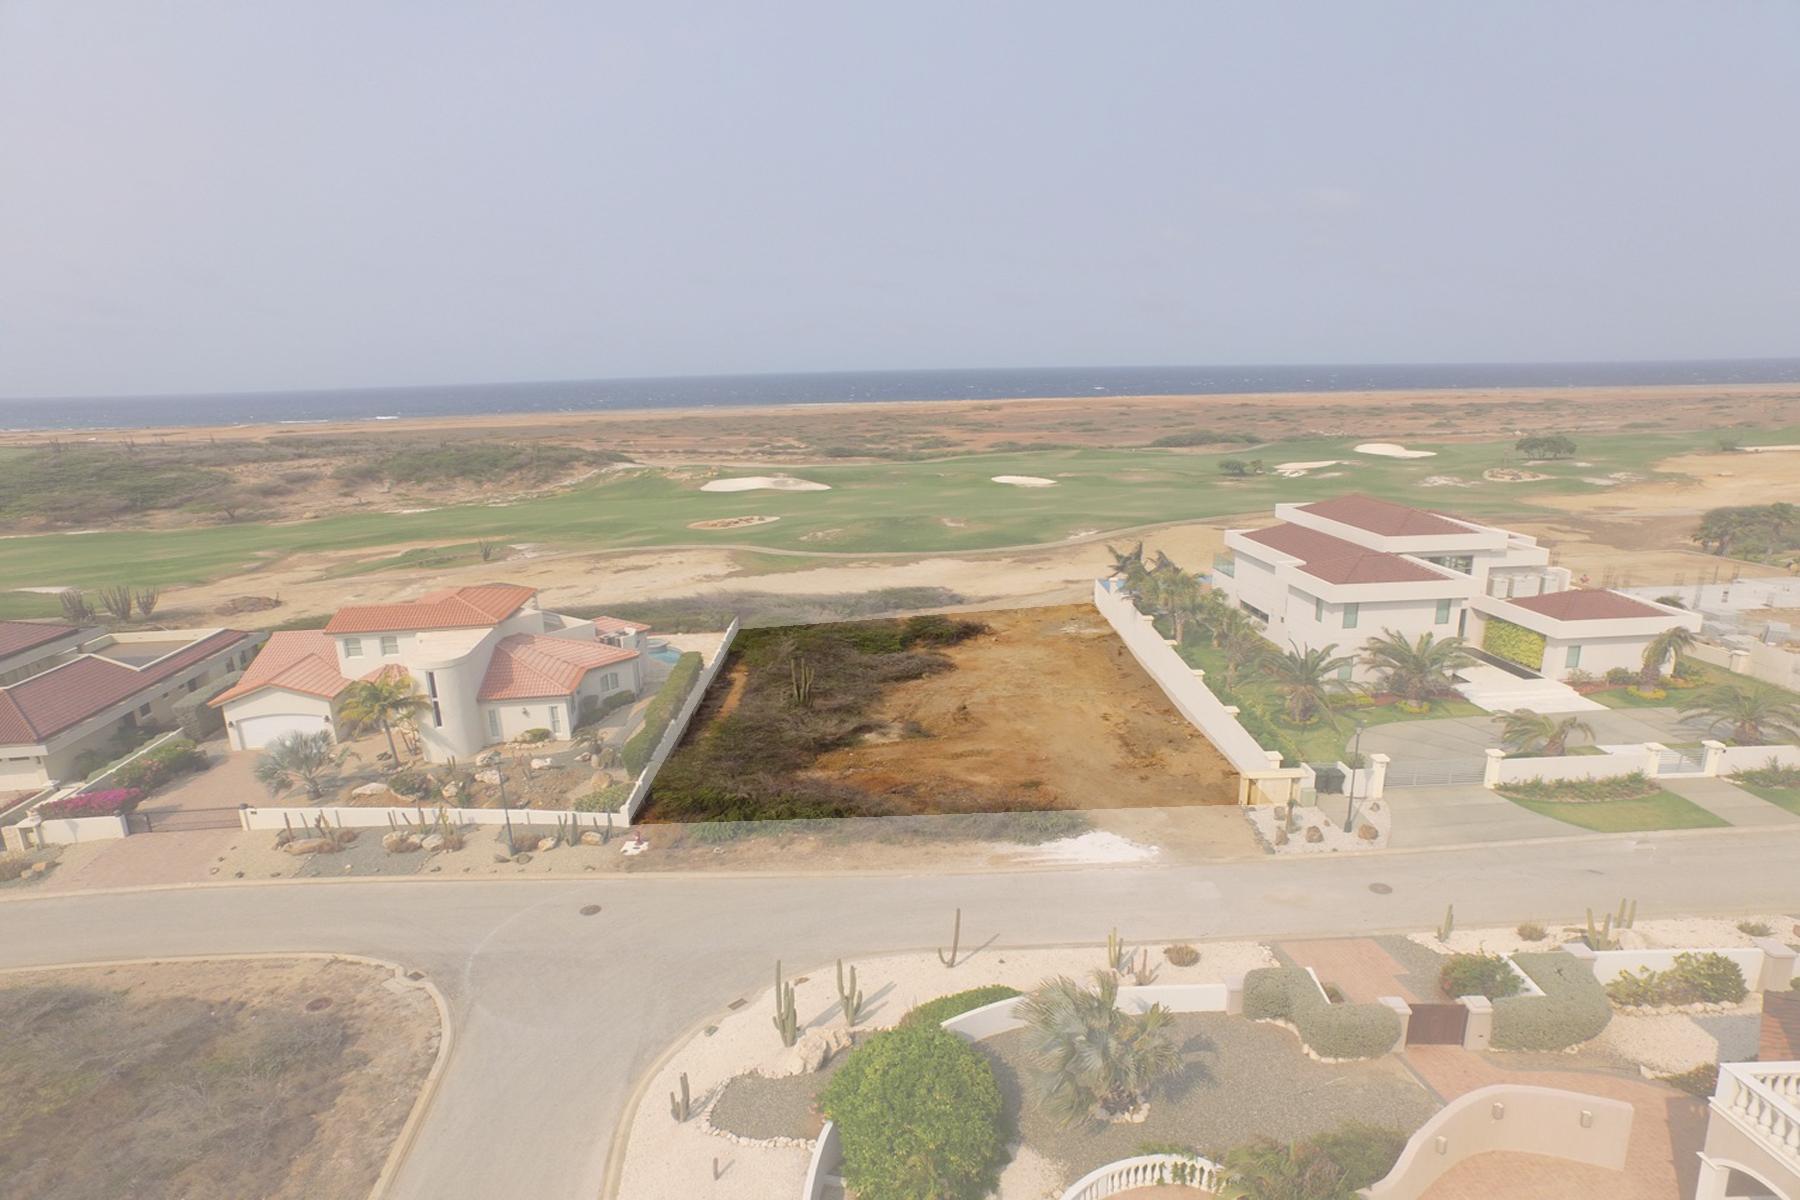 Terreno por un Venta en La Colina 9 Malmok, Aruba Aruba